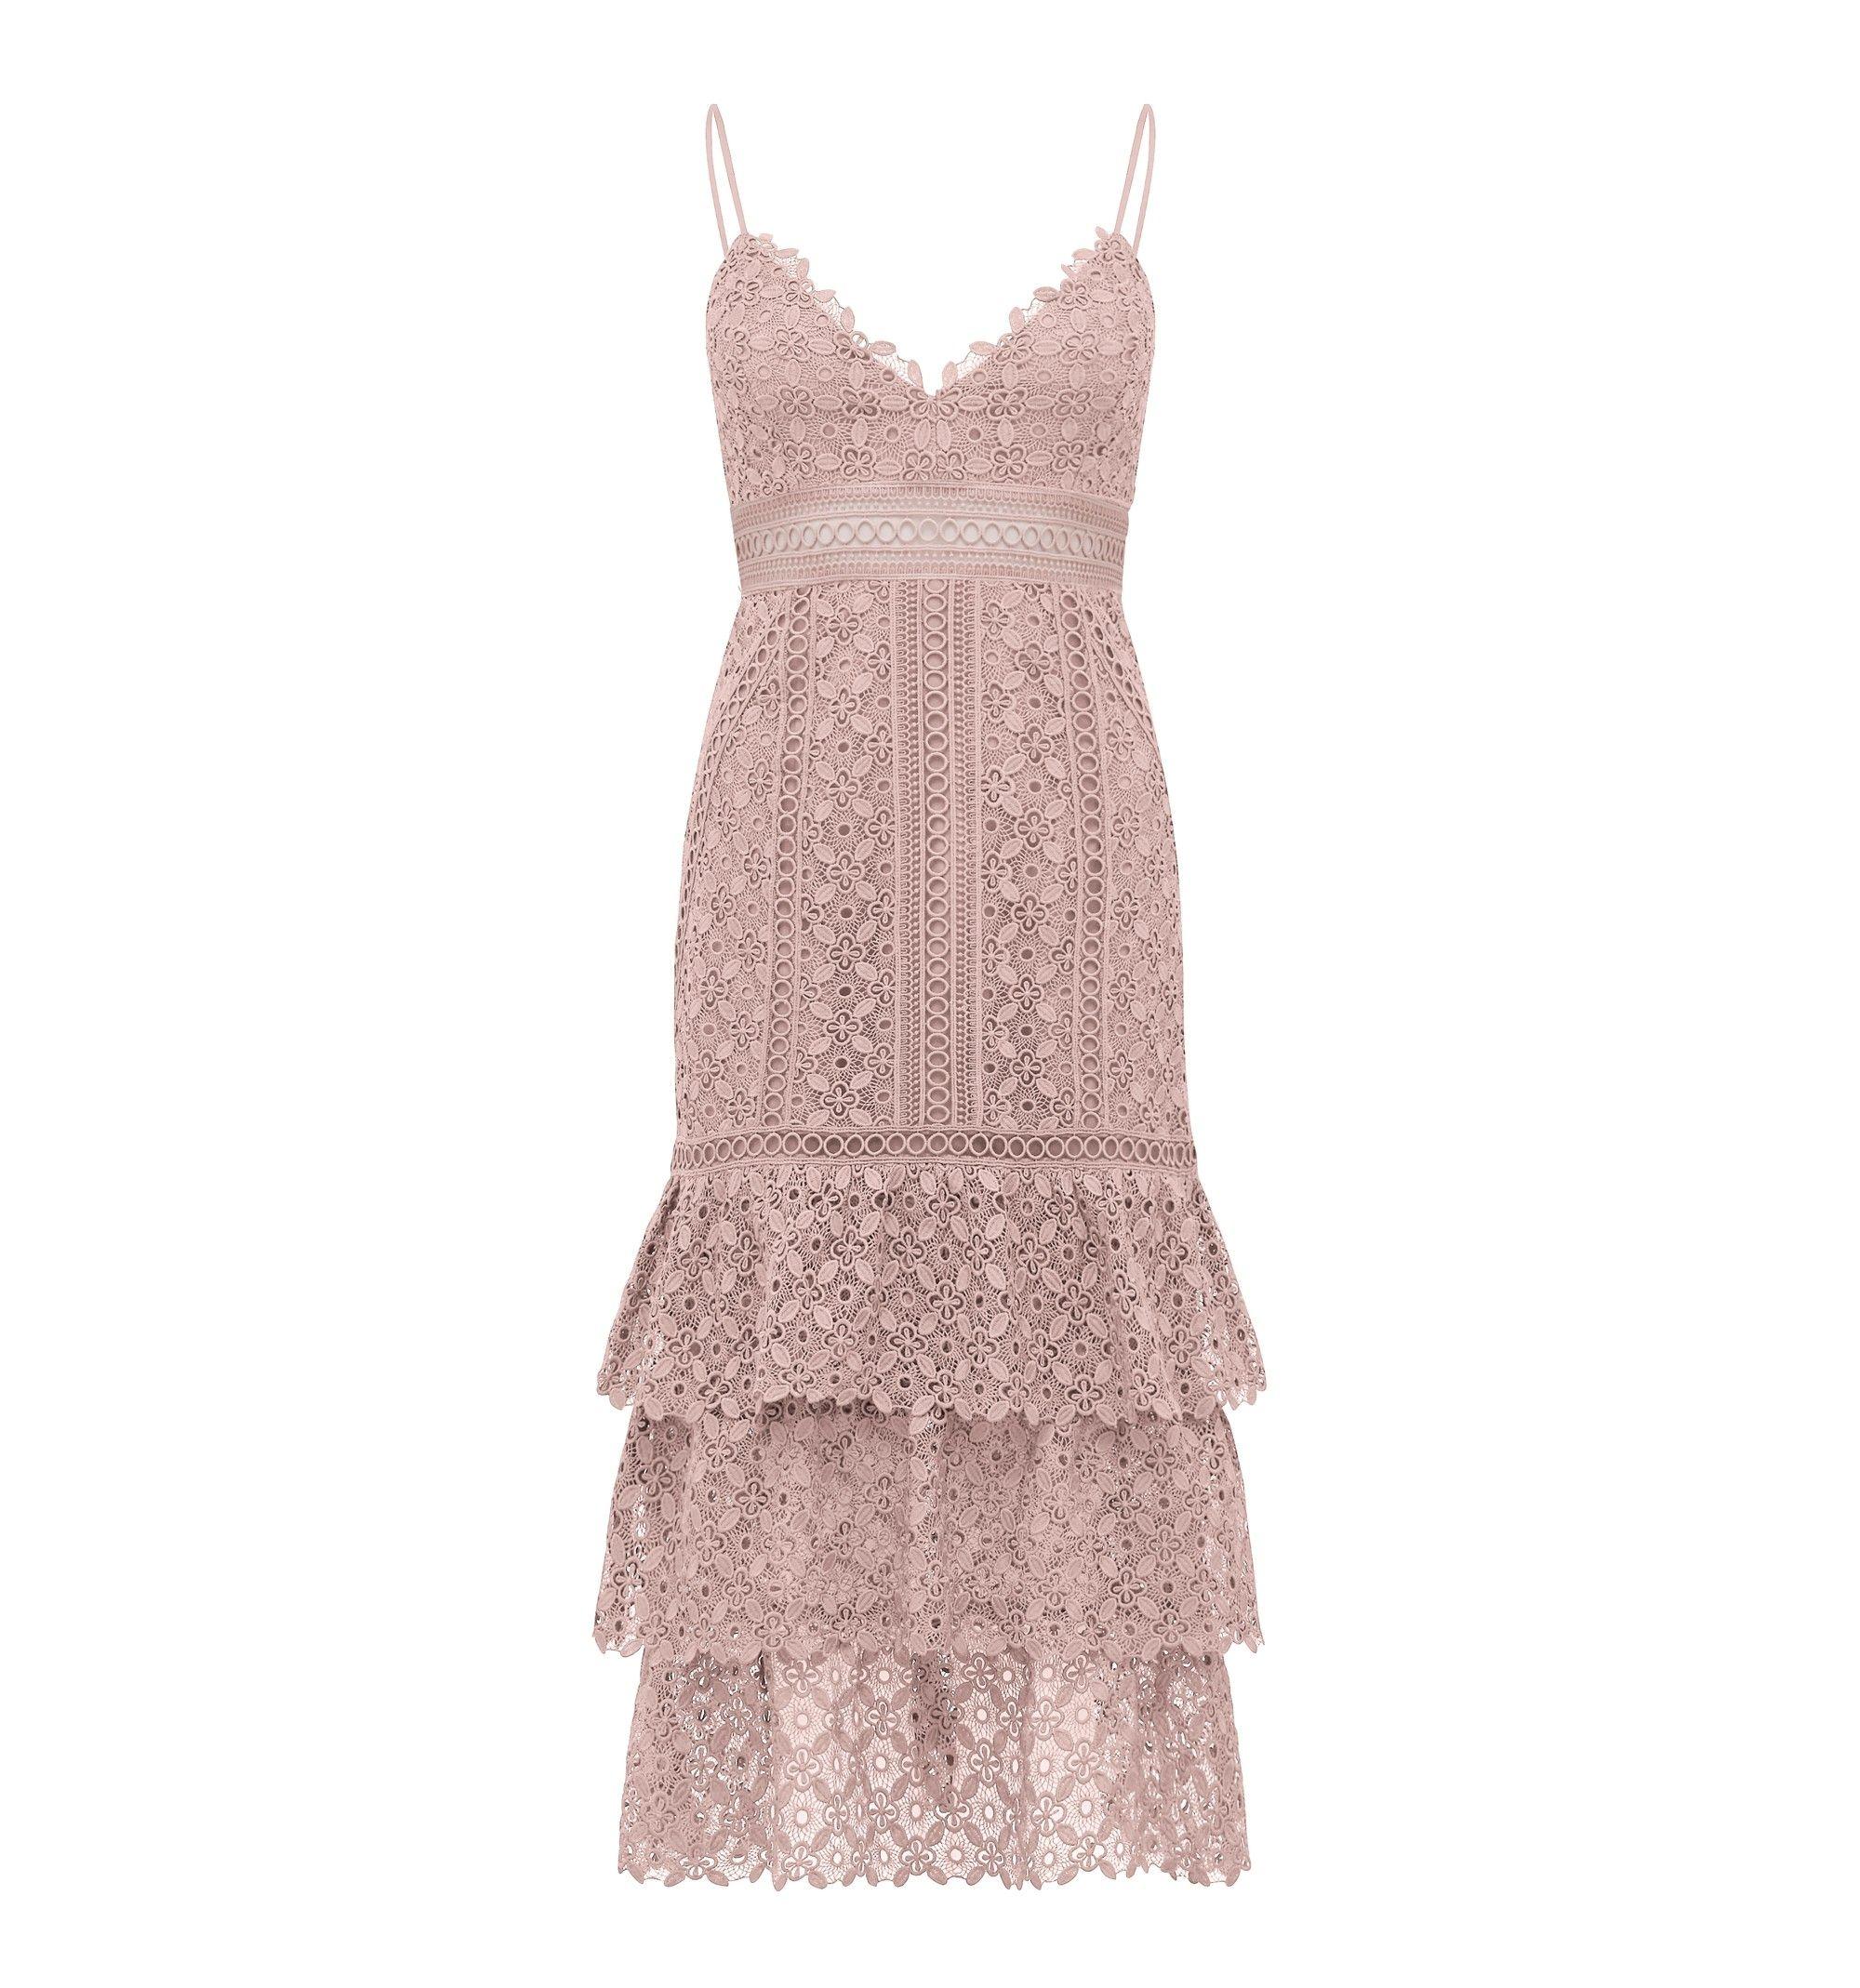 3daa706c83e6 Katie Petite Lace Tier Dress Blush - Womens Fashion